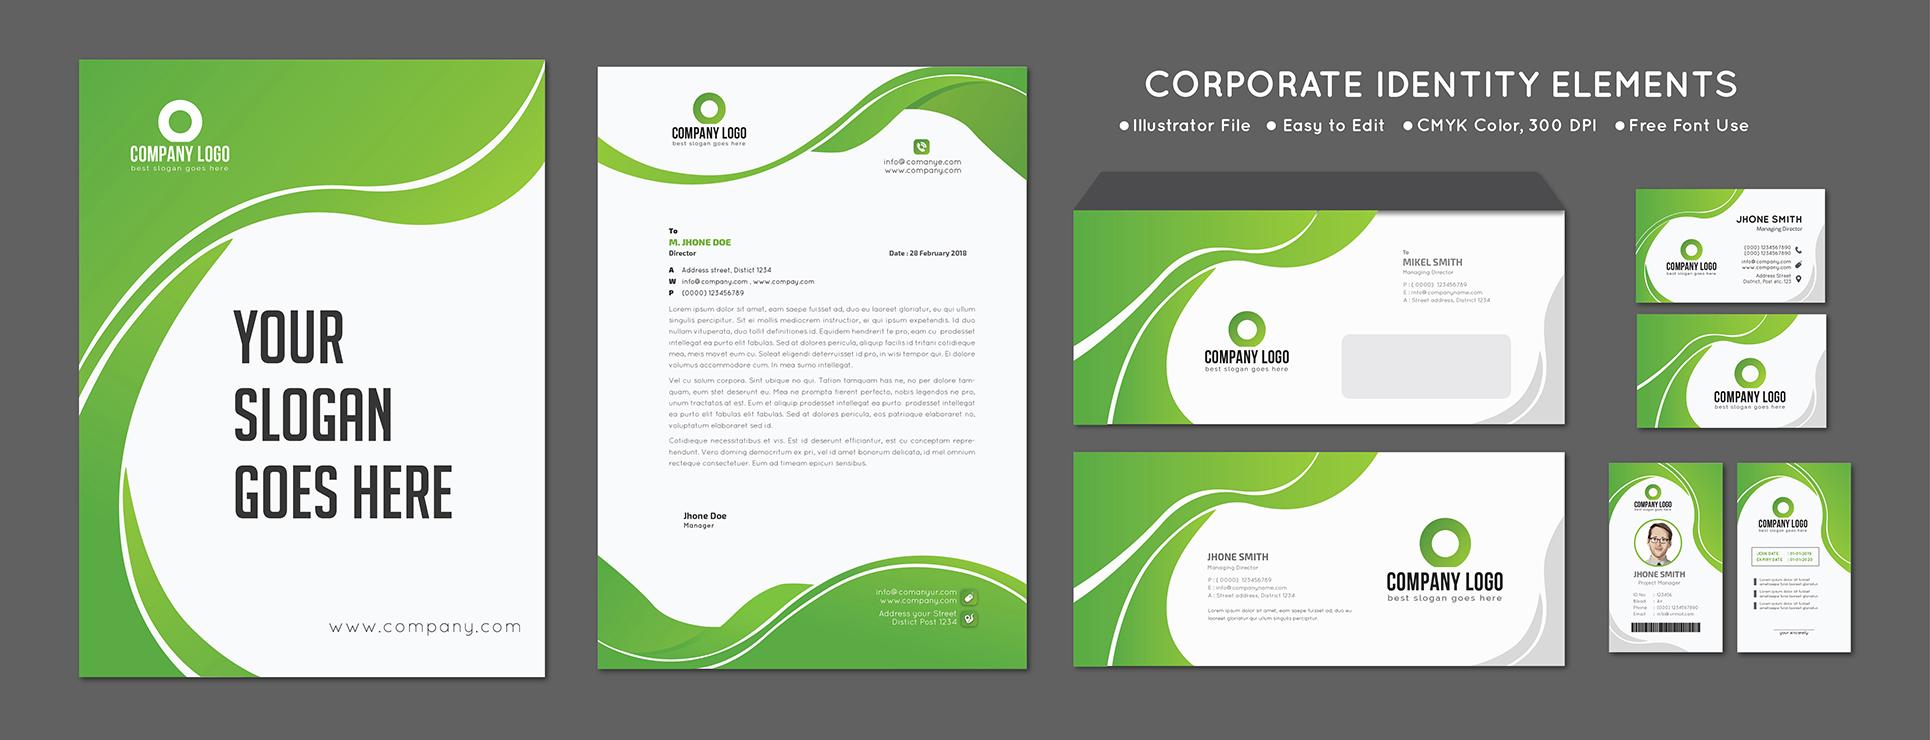 Green Brand Corporate Identity